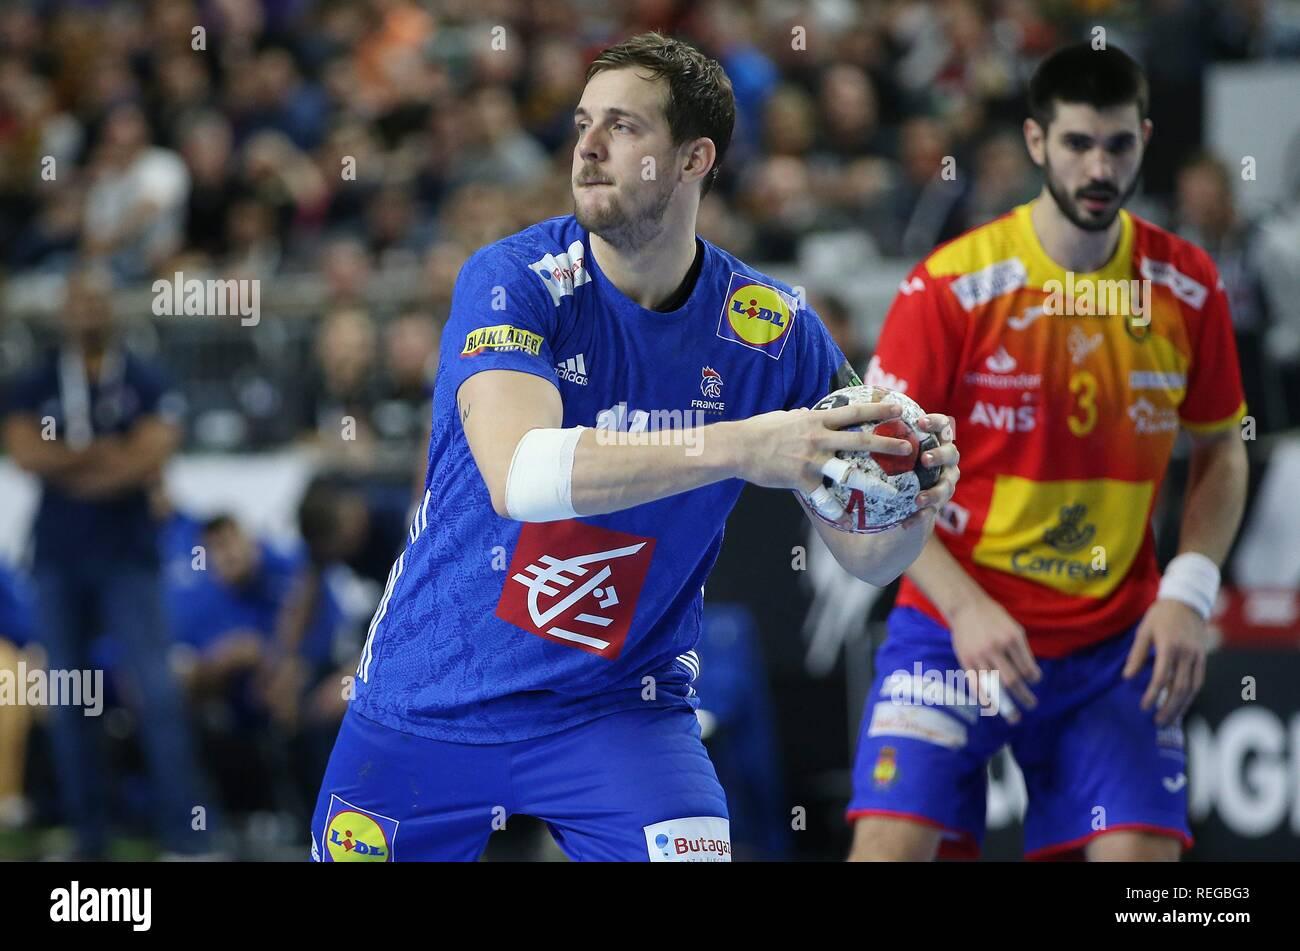 firo: 19.01.2019, Handball: World Cup World Cup Main Round France - Spain Kentin Mahe, single action, FRA   usage worldwide - Stock Image